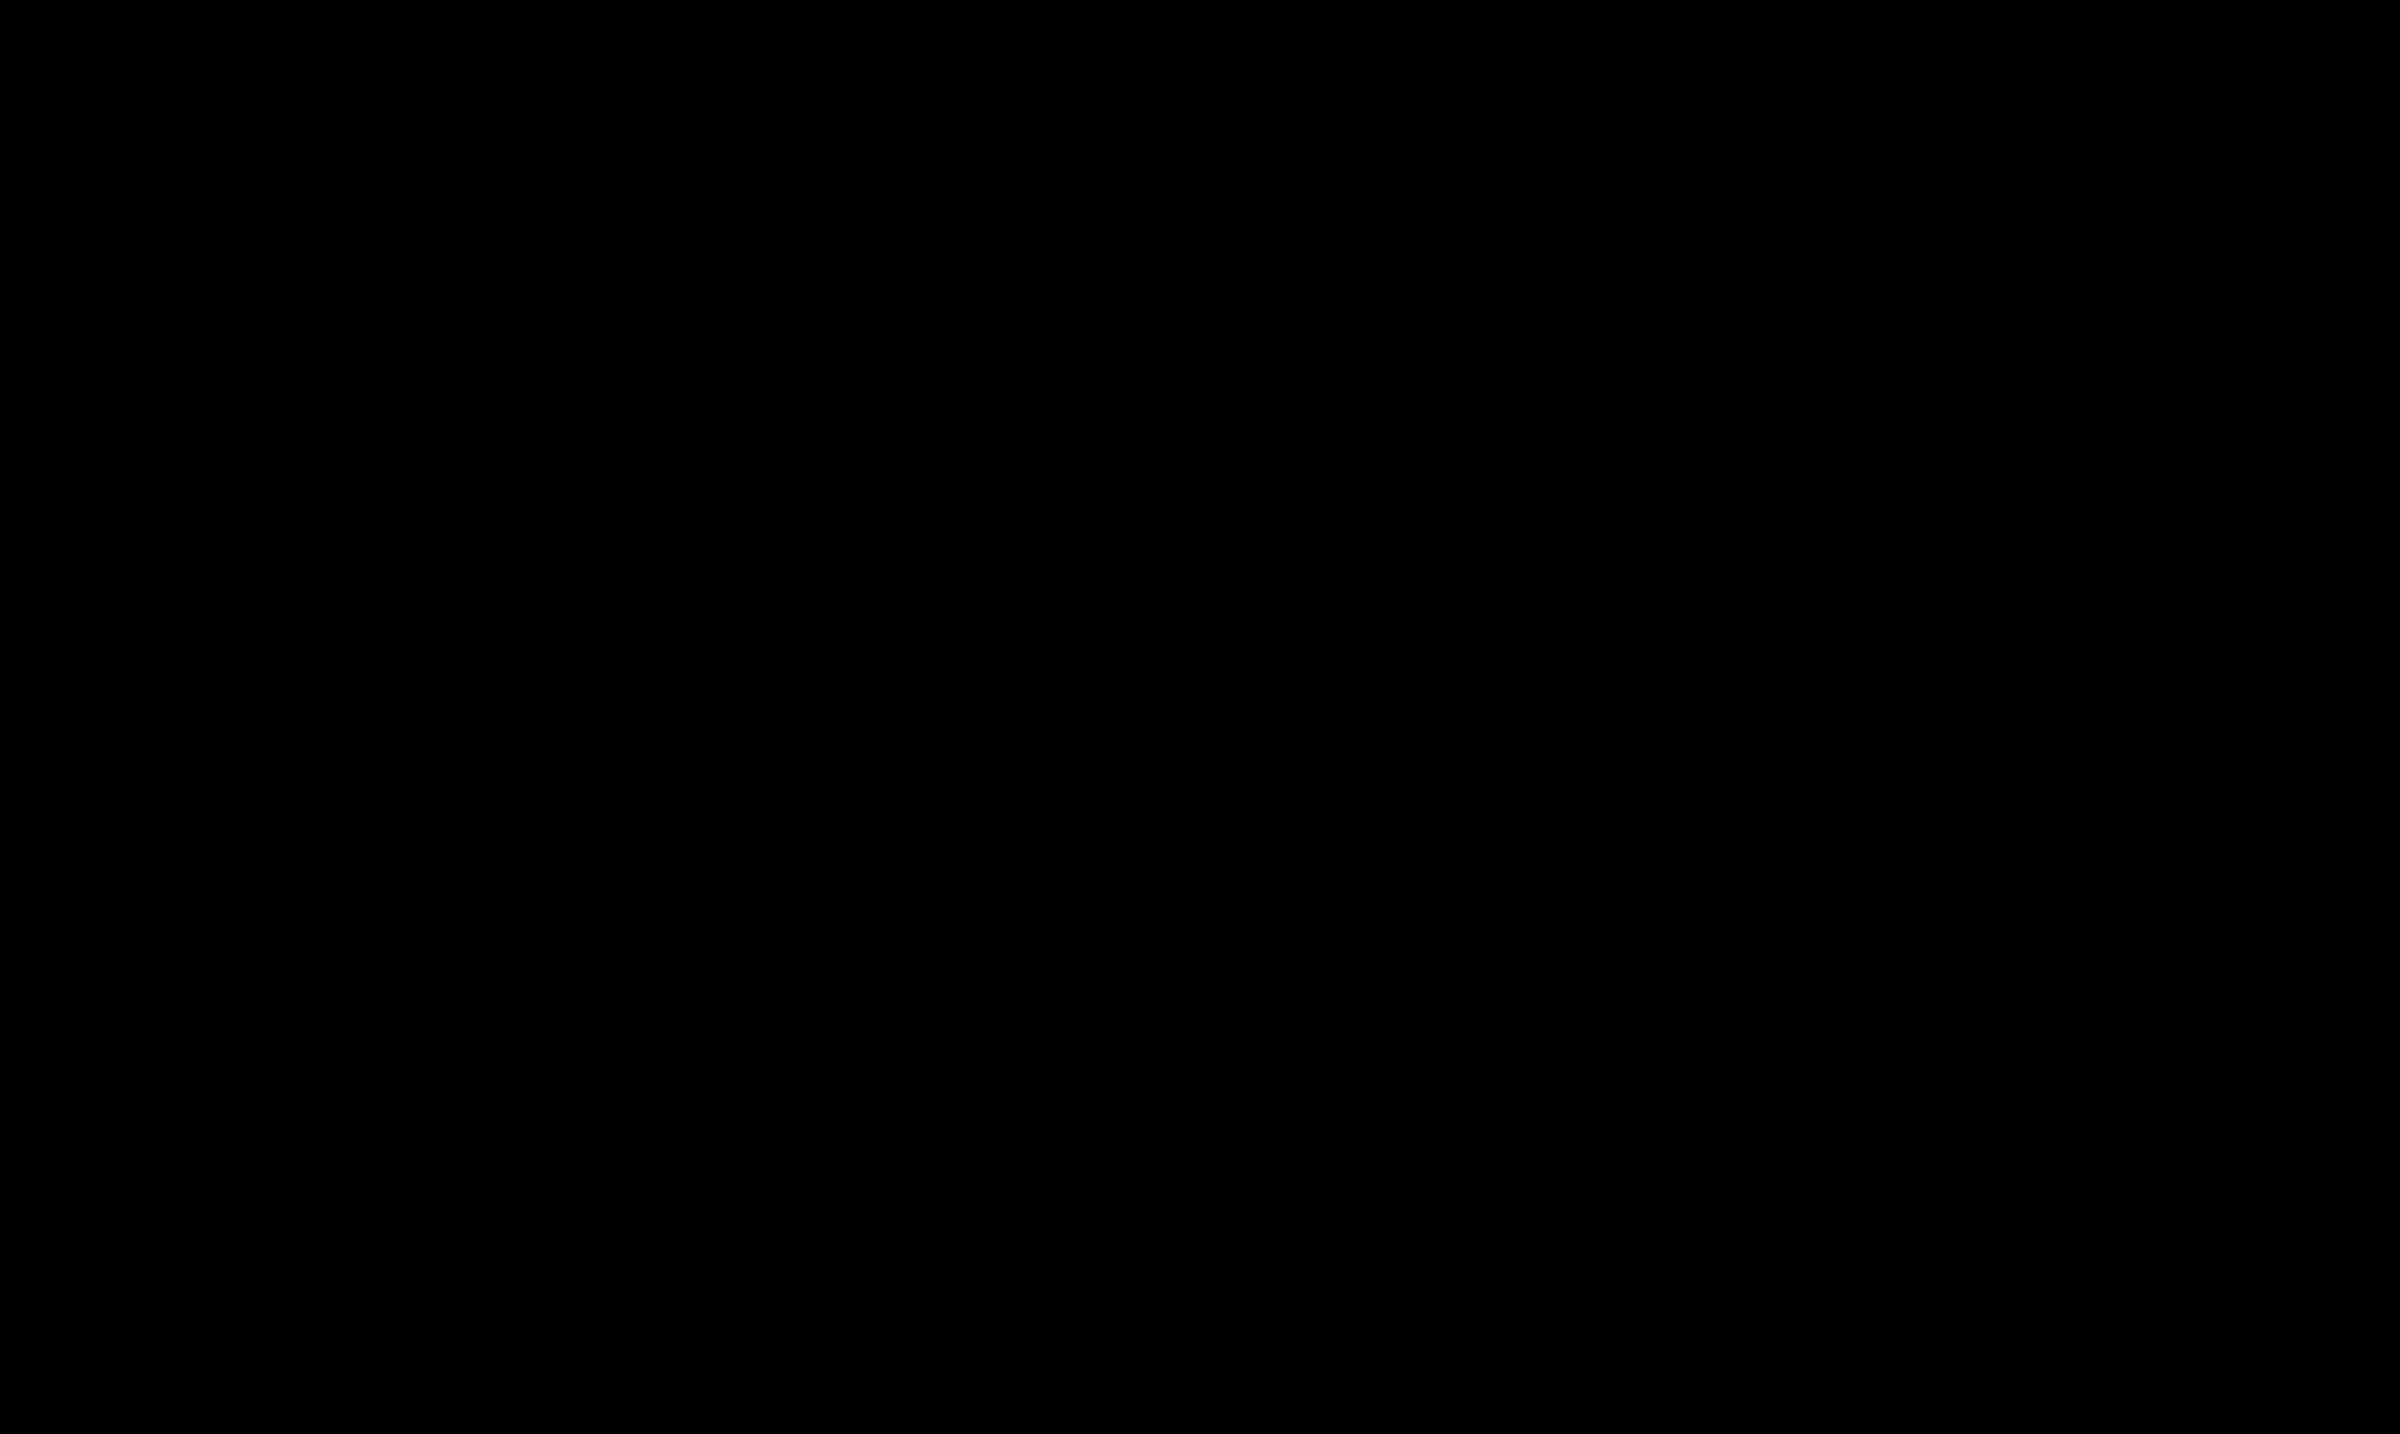 2400x1434 Clipart